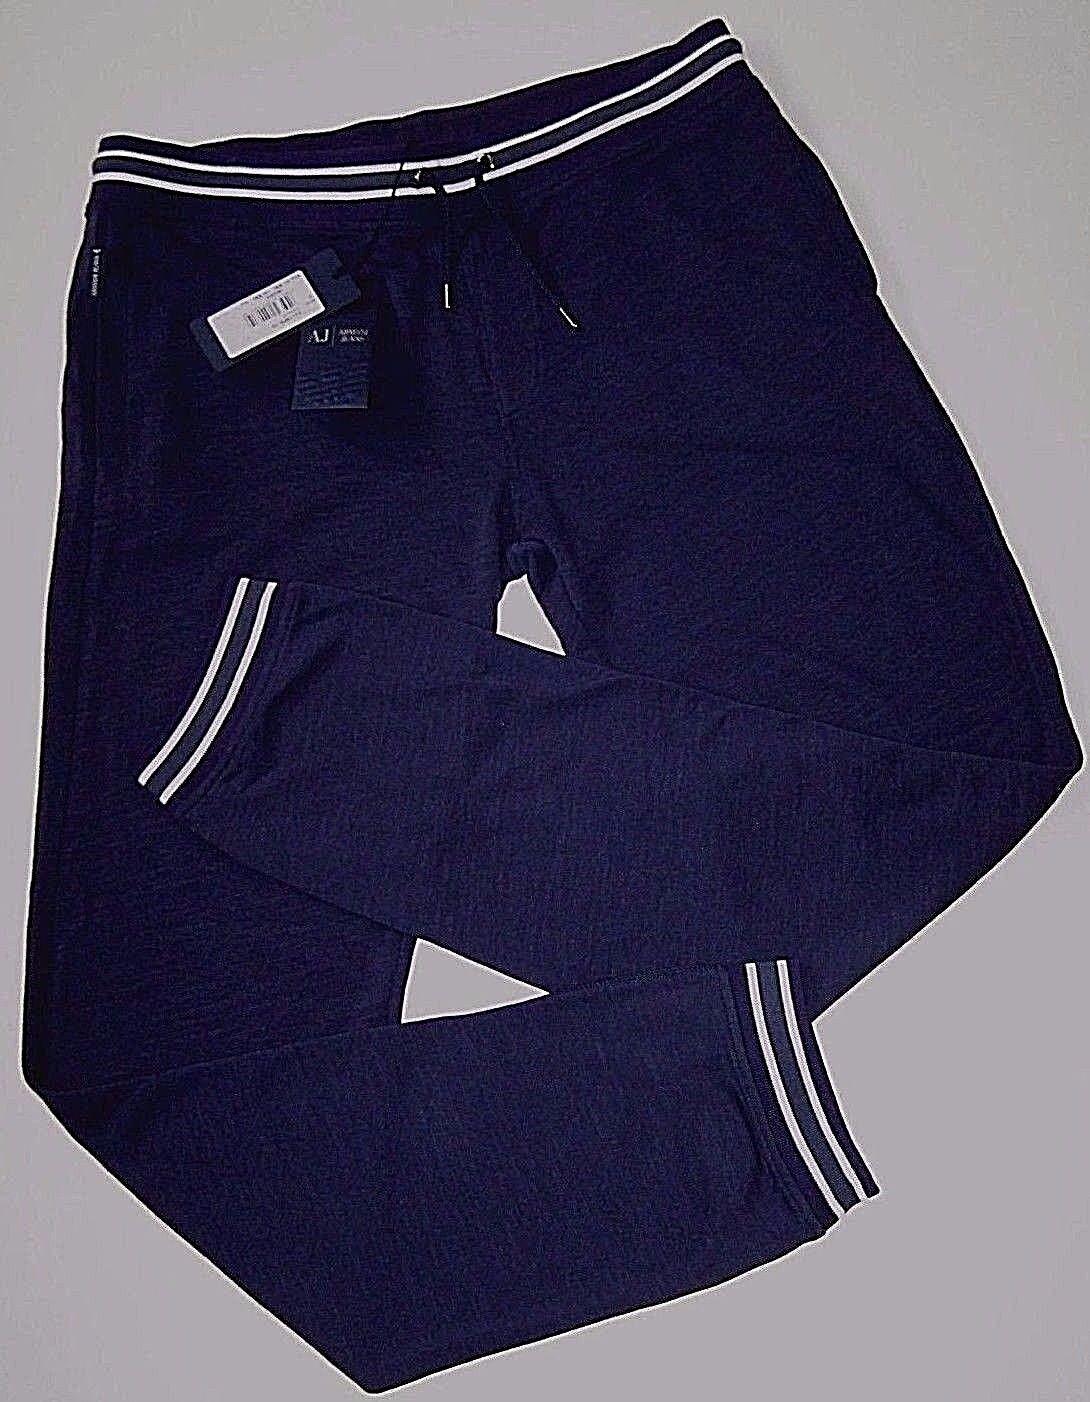 AJ ARMANI JEANS AUTHENTIC JOGGER NAVY blueE COTTON PANTS size XXL NEW w TAGS